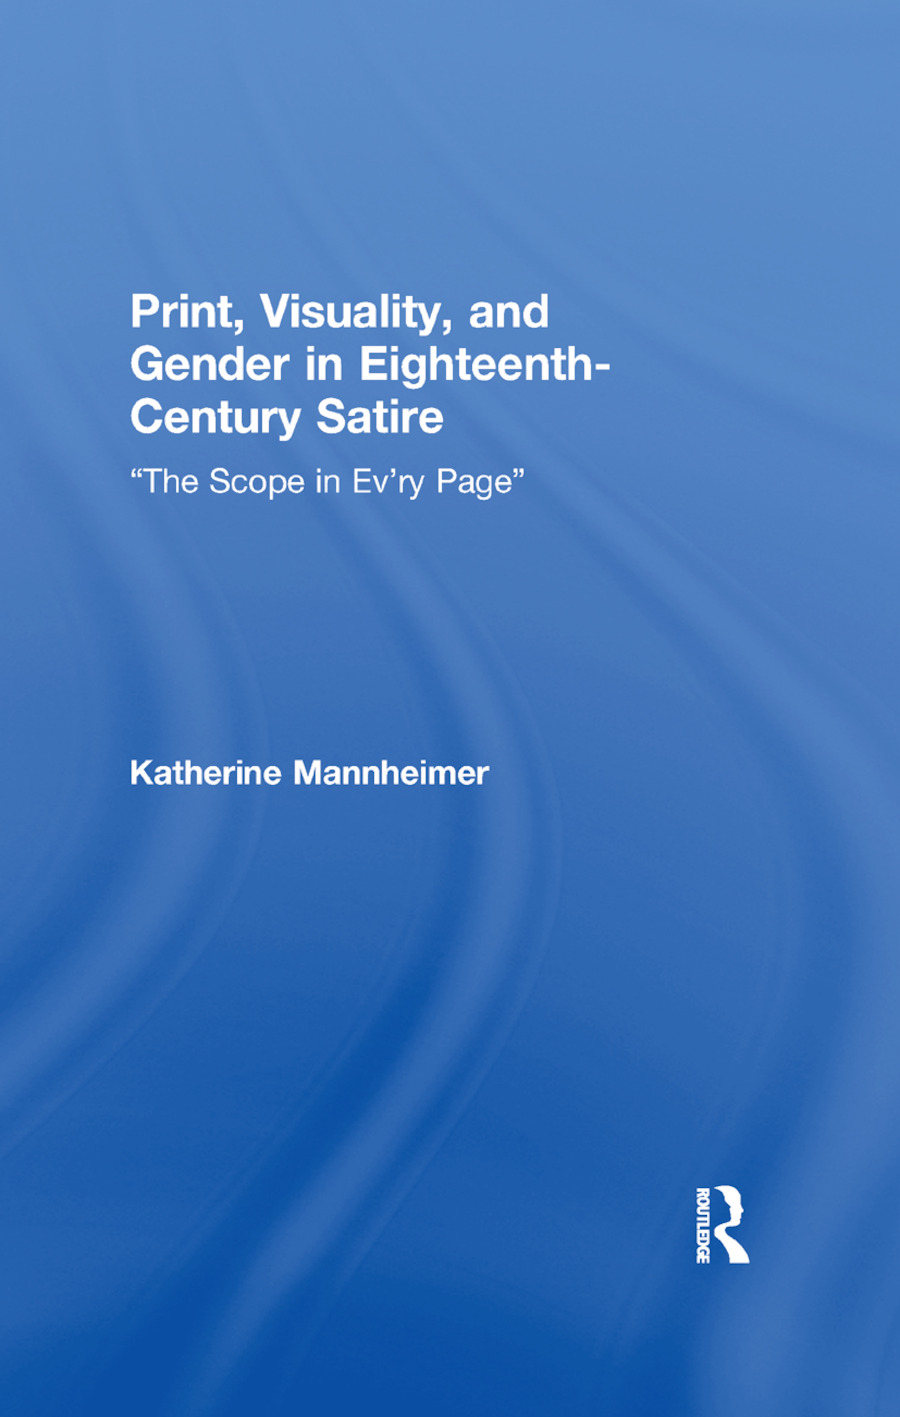 Print, Visuality, and Gender in Eighteenth-Century Satire